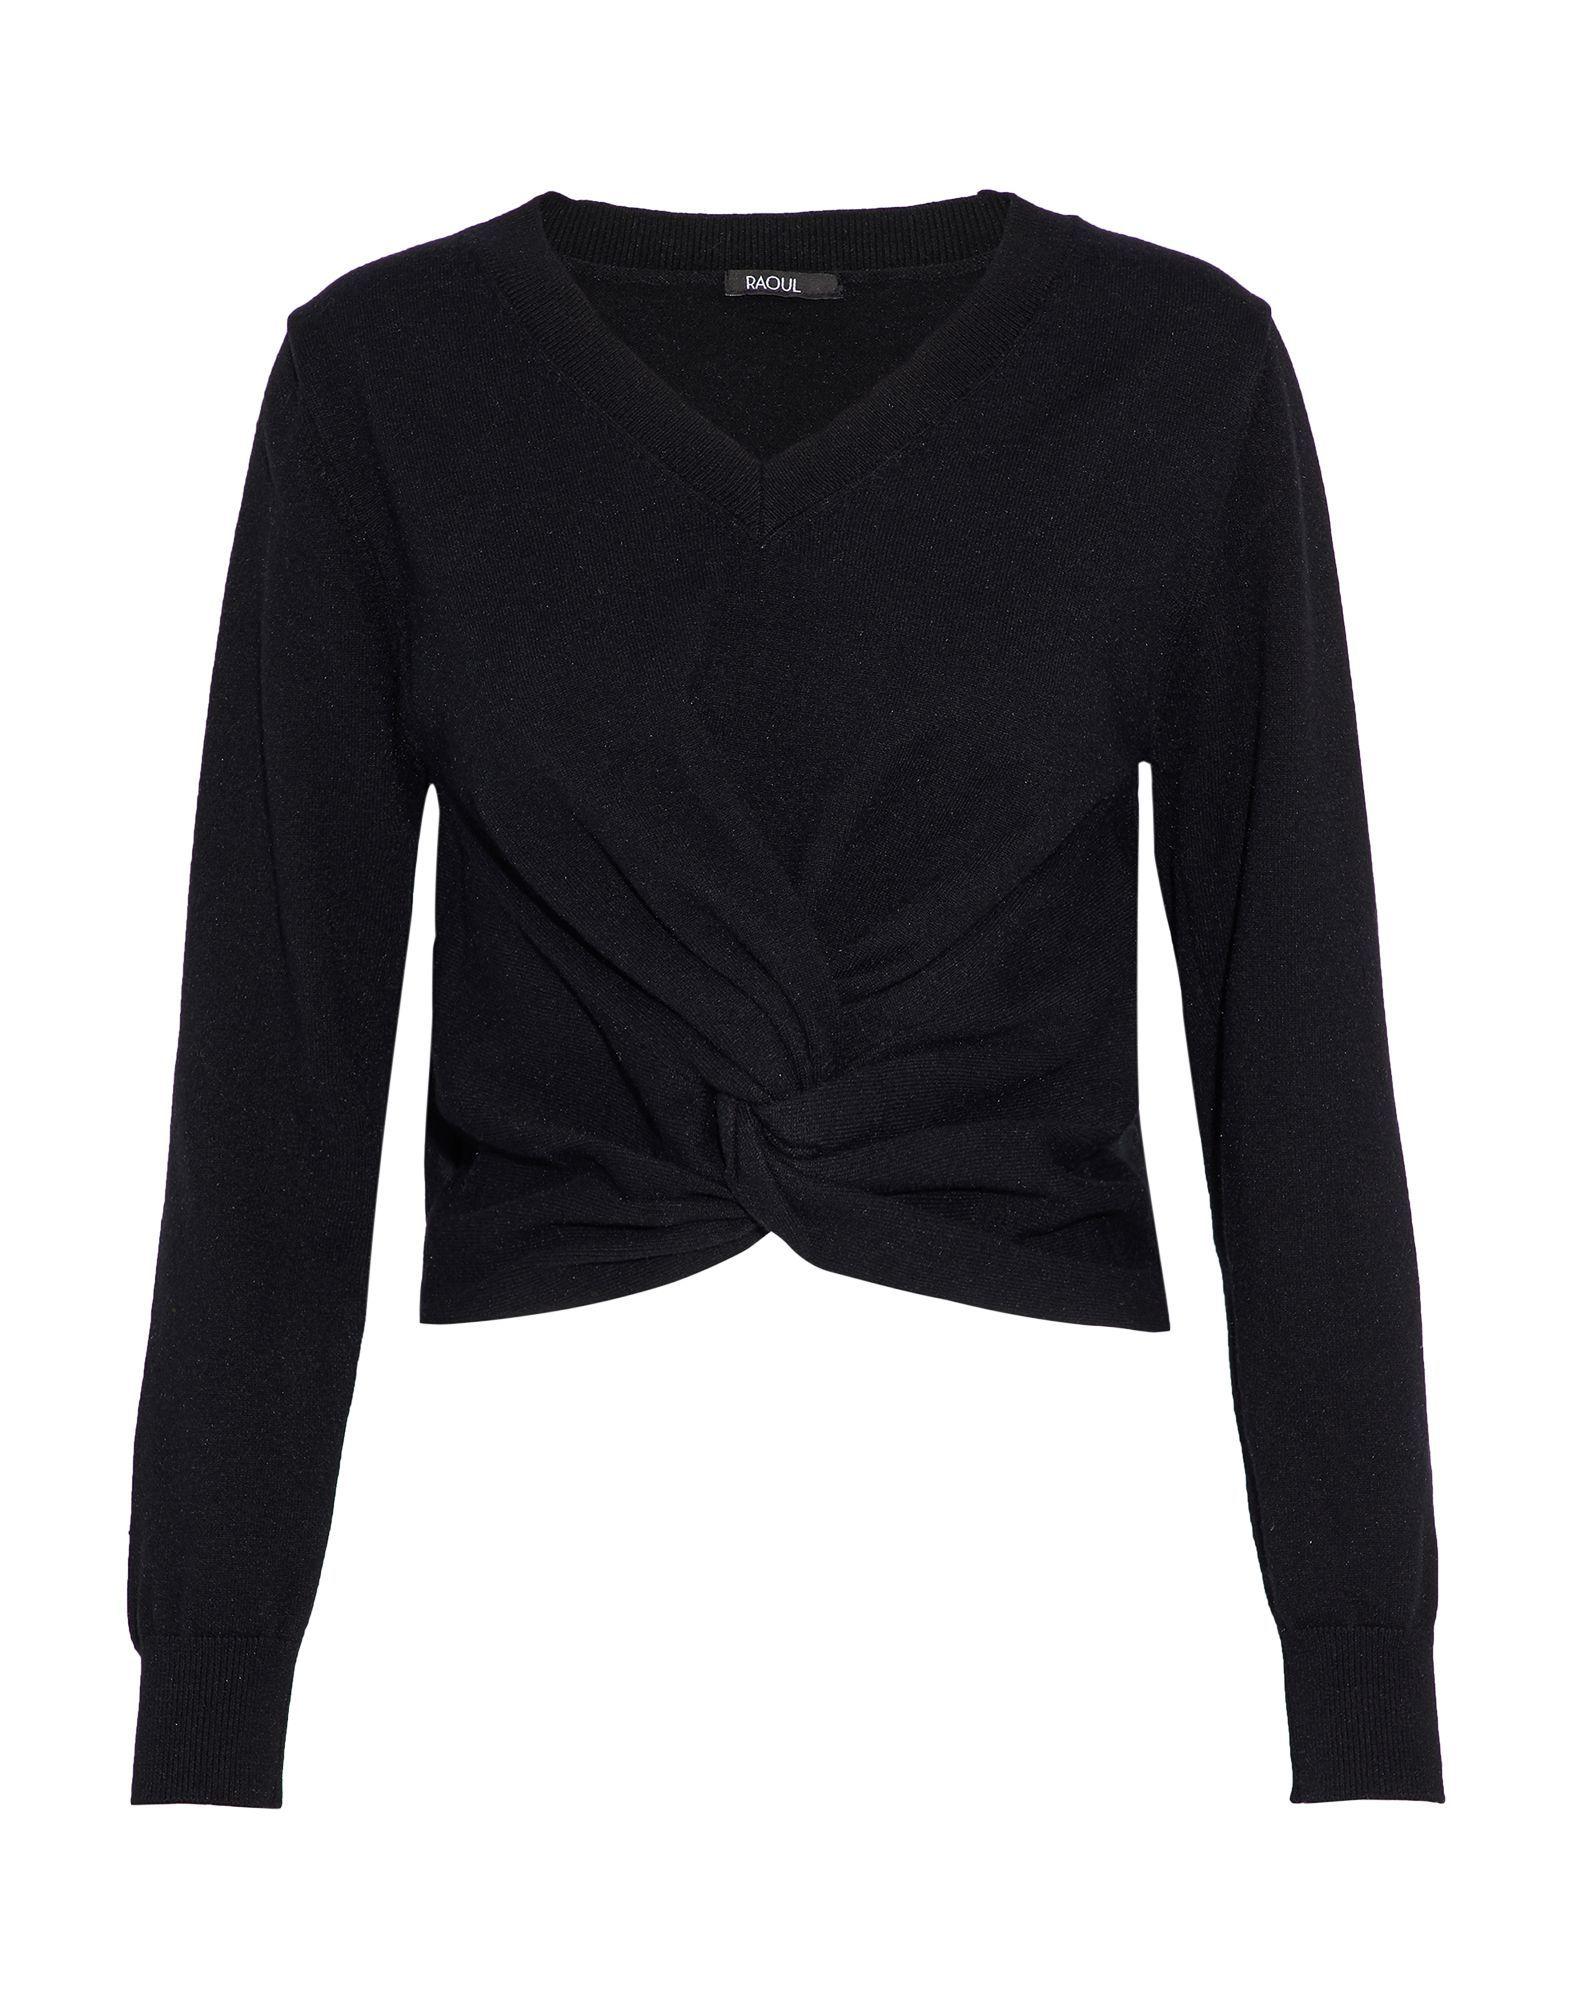 Raoul Black Cotton Lightweight Knit